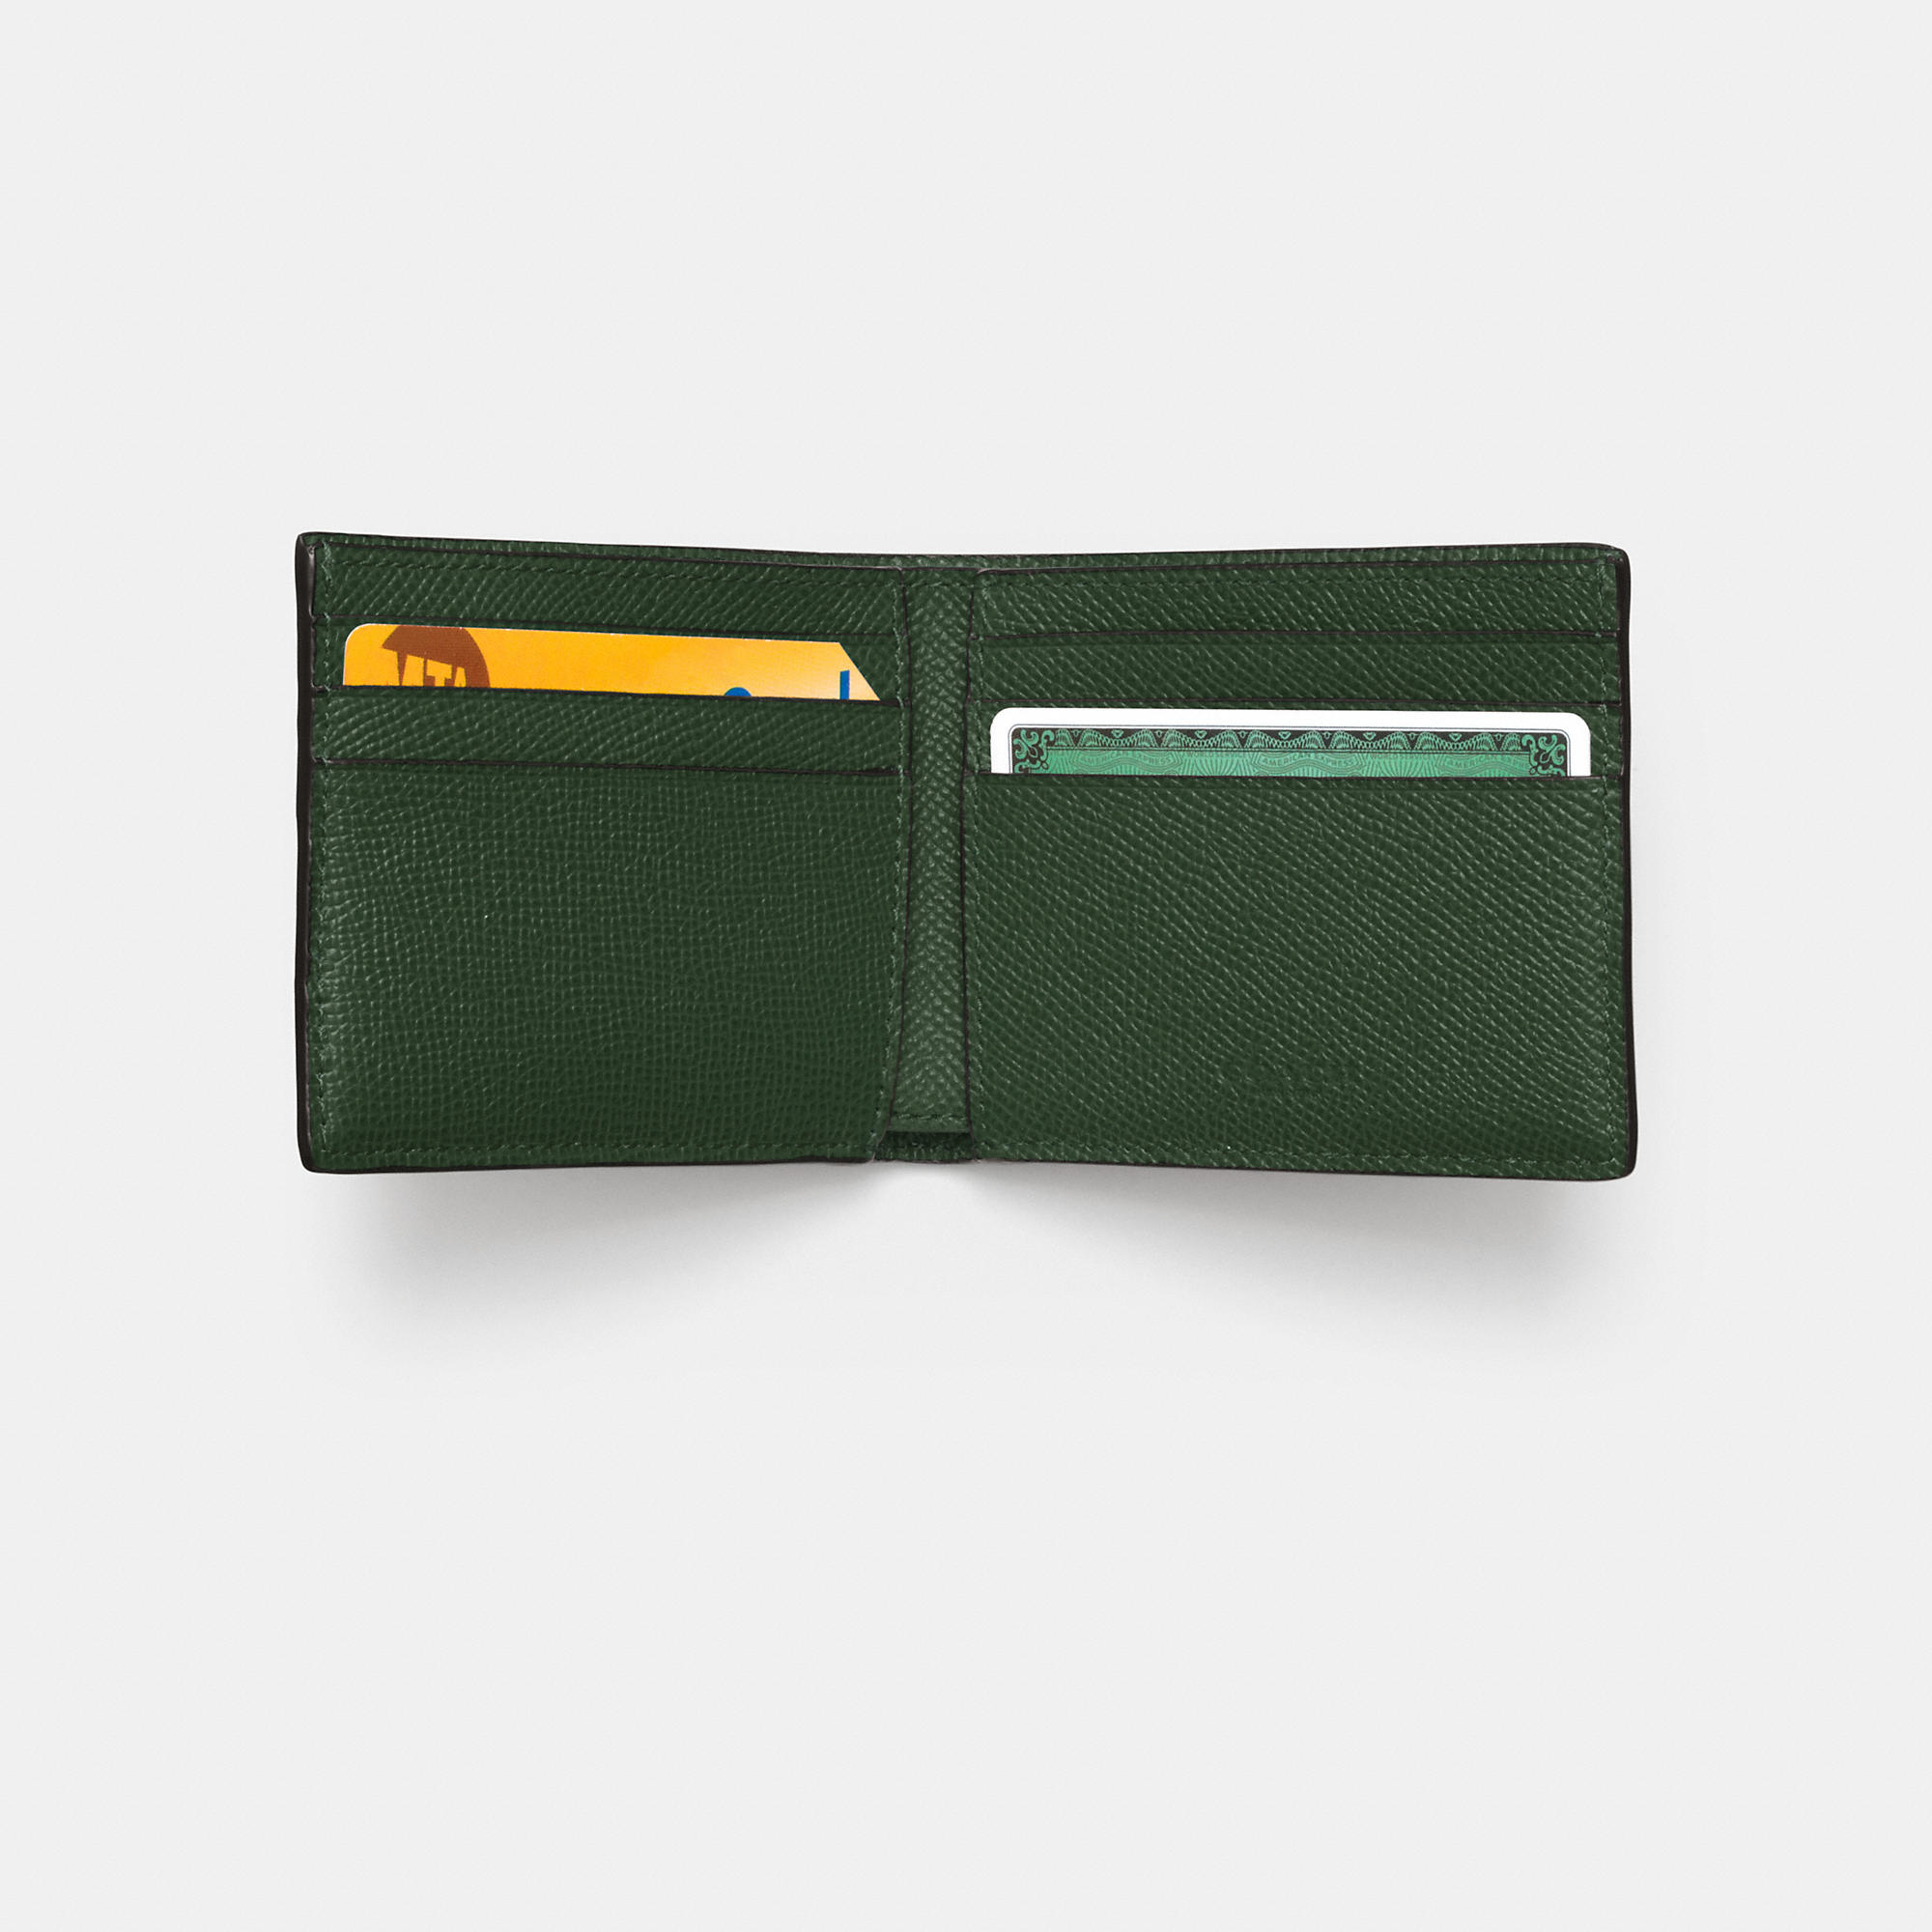 9f2cb6a3 clearance coach mens wallet green fd900 6758e